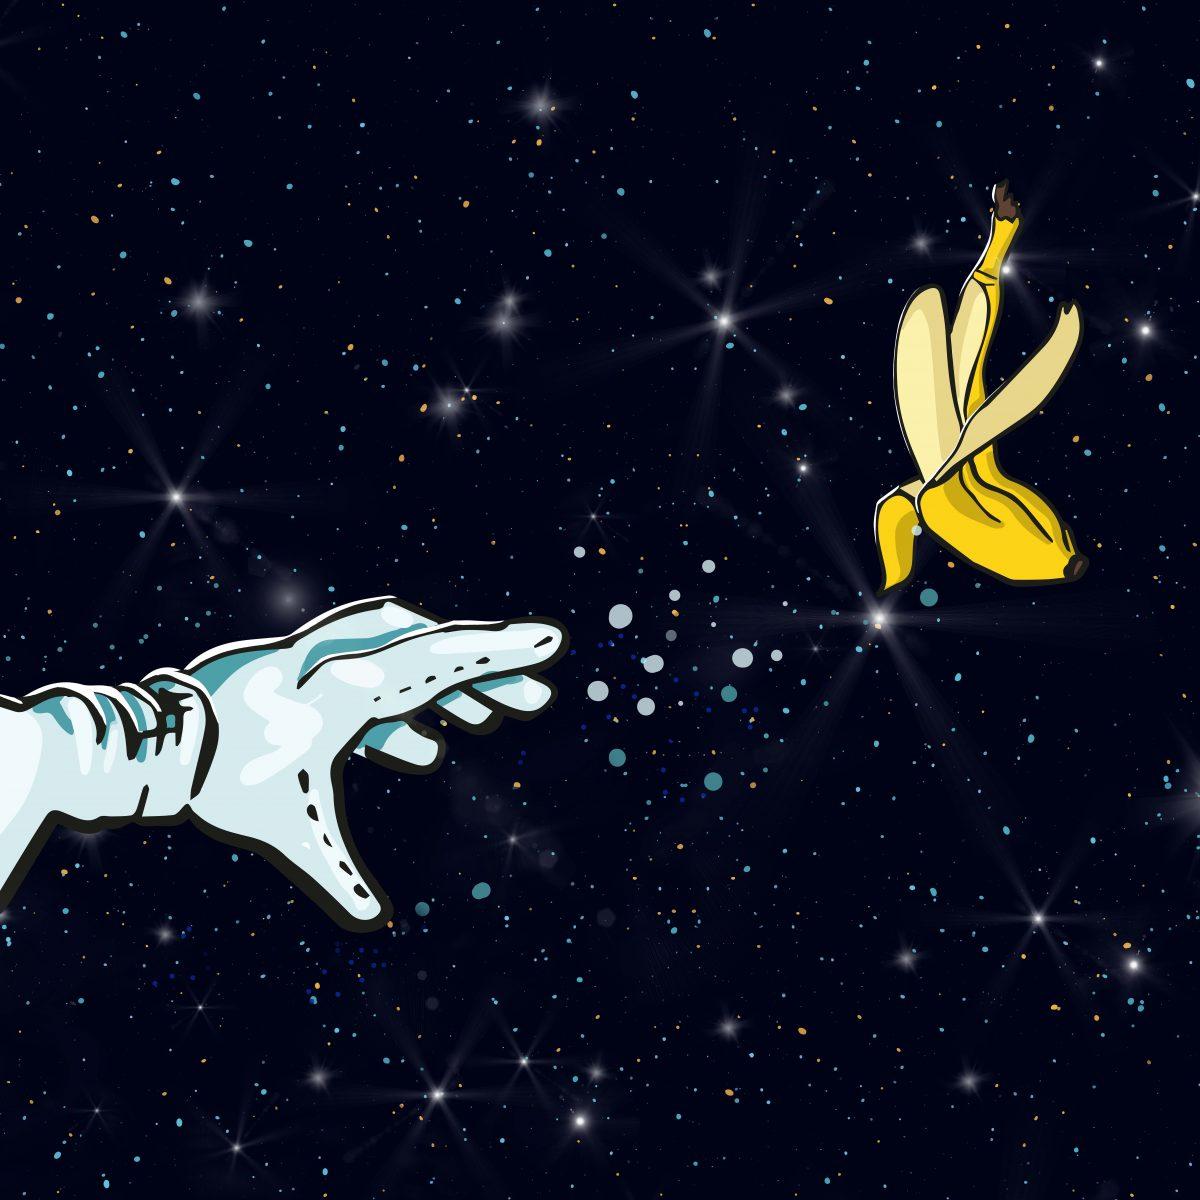 Suberbude_Spacemonkey_HofmannJulia_HAND